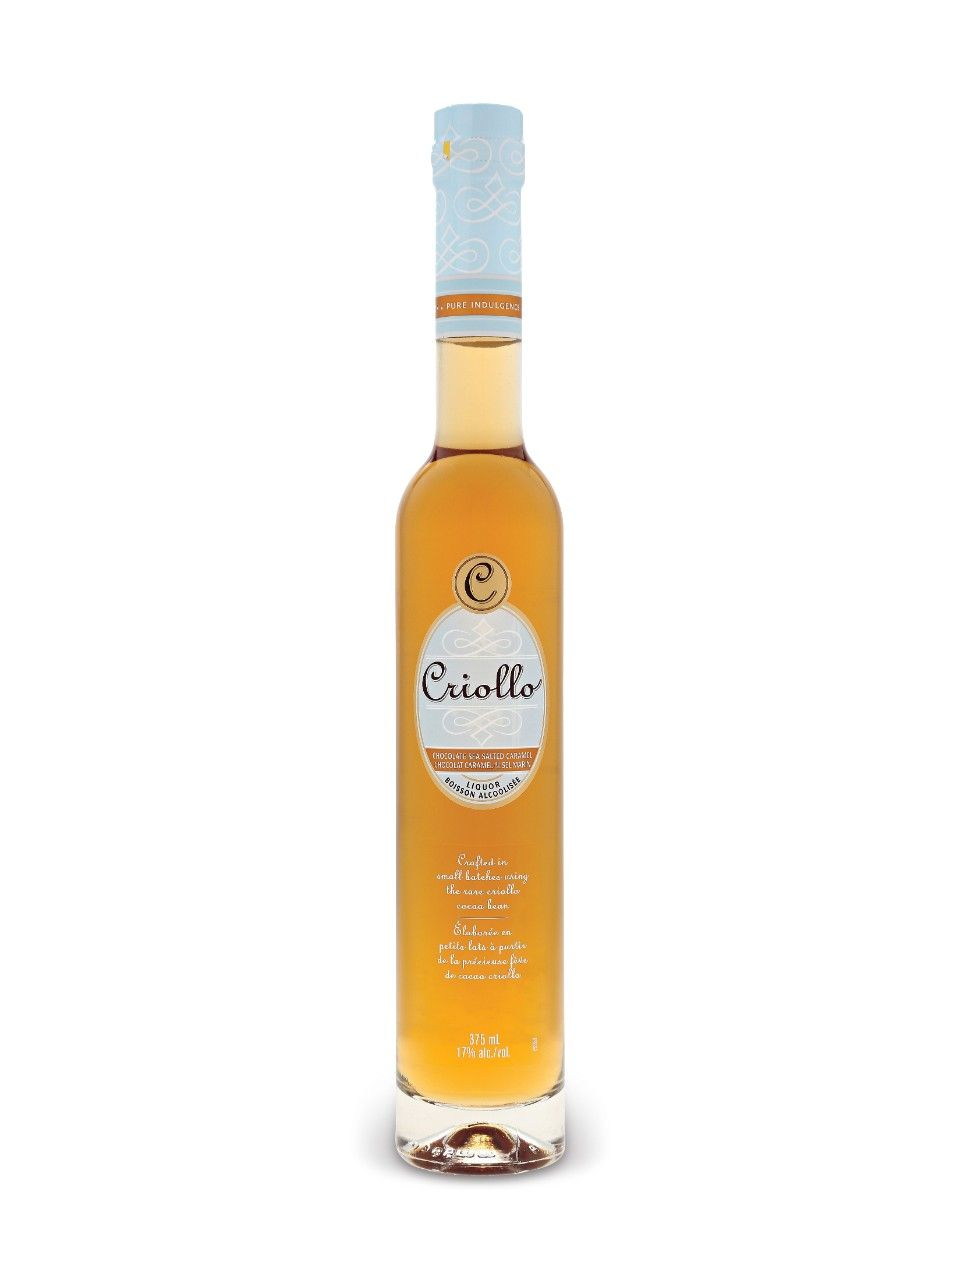 Criollo Chocolate Sea Salted Caramel Liquor | gift ideas ...